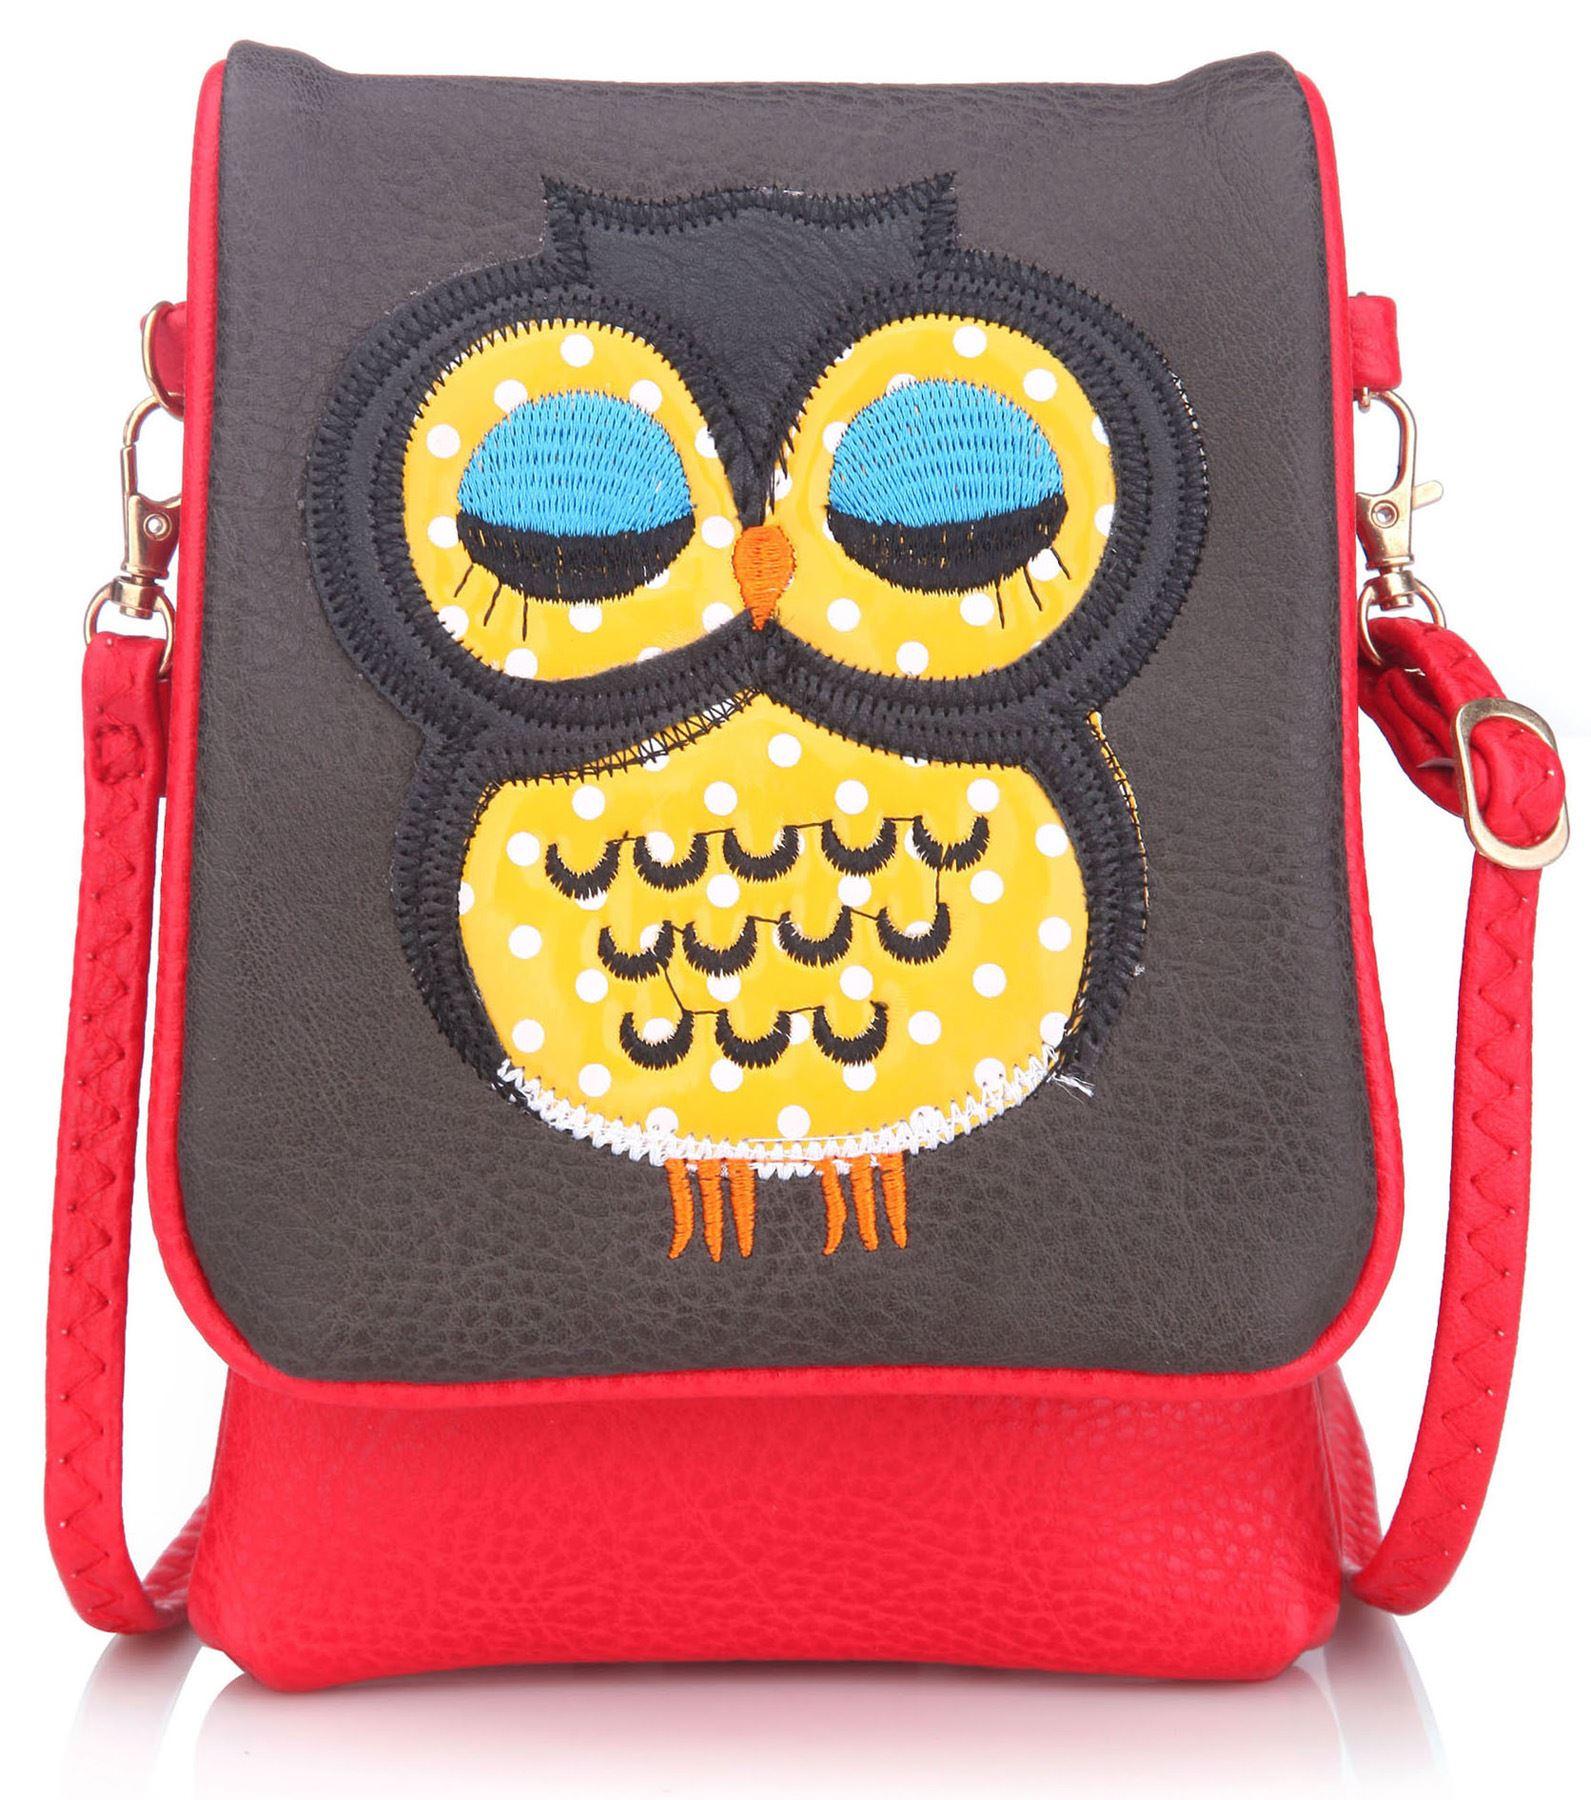 Big Handbag Shop Kinder Sleeping Eule Schultertasche Messenger Handytasche